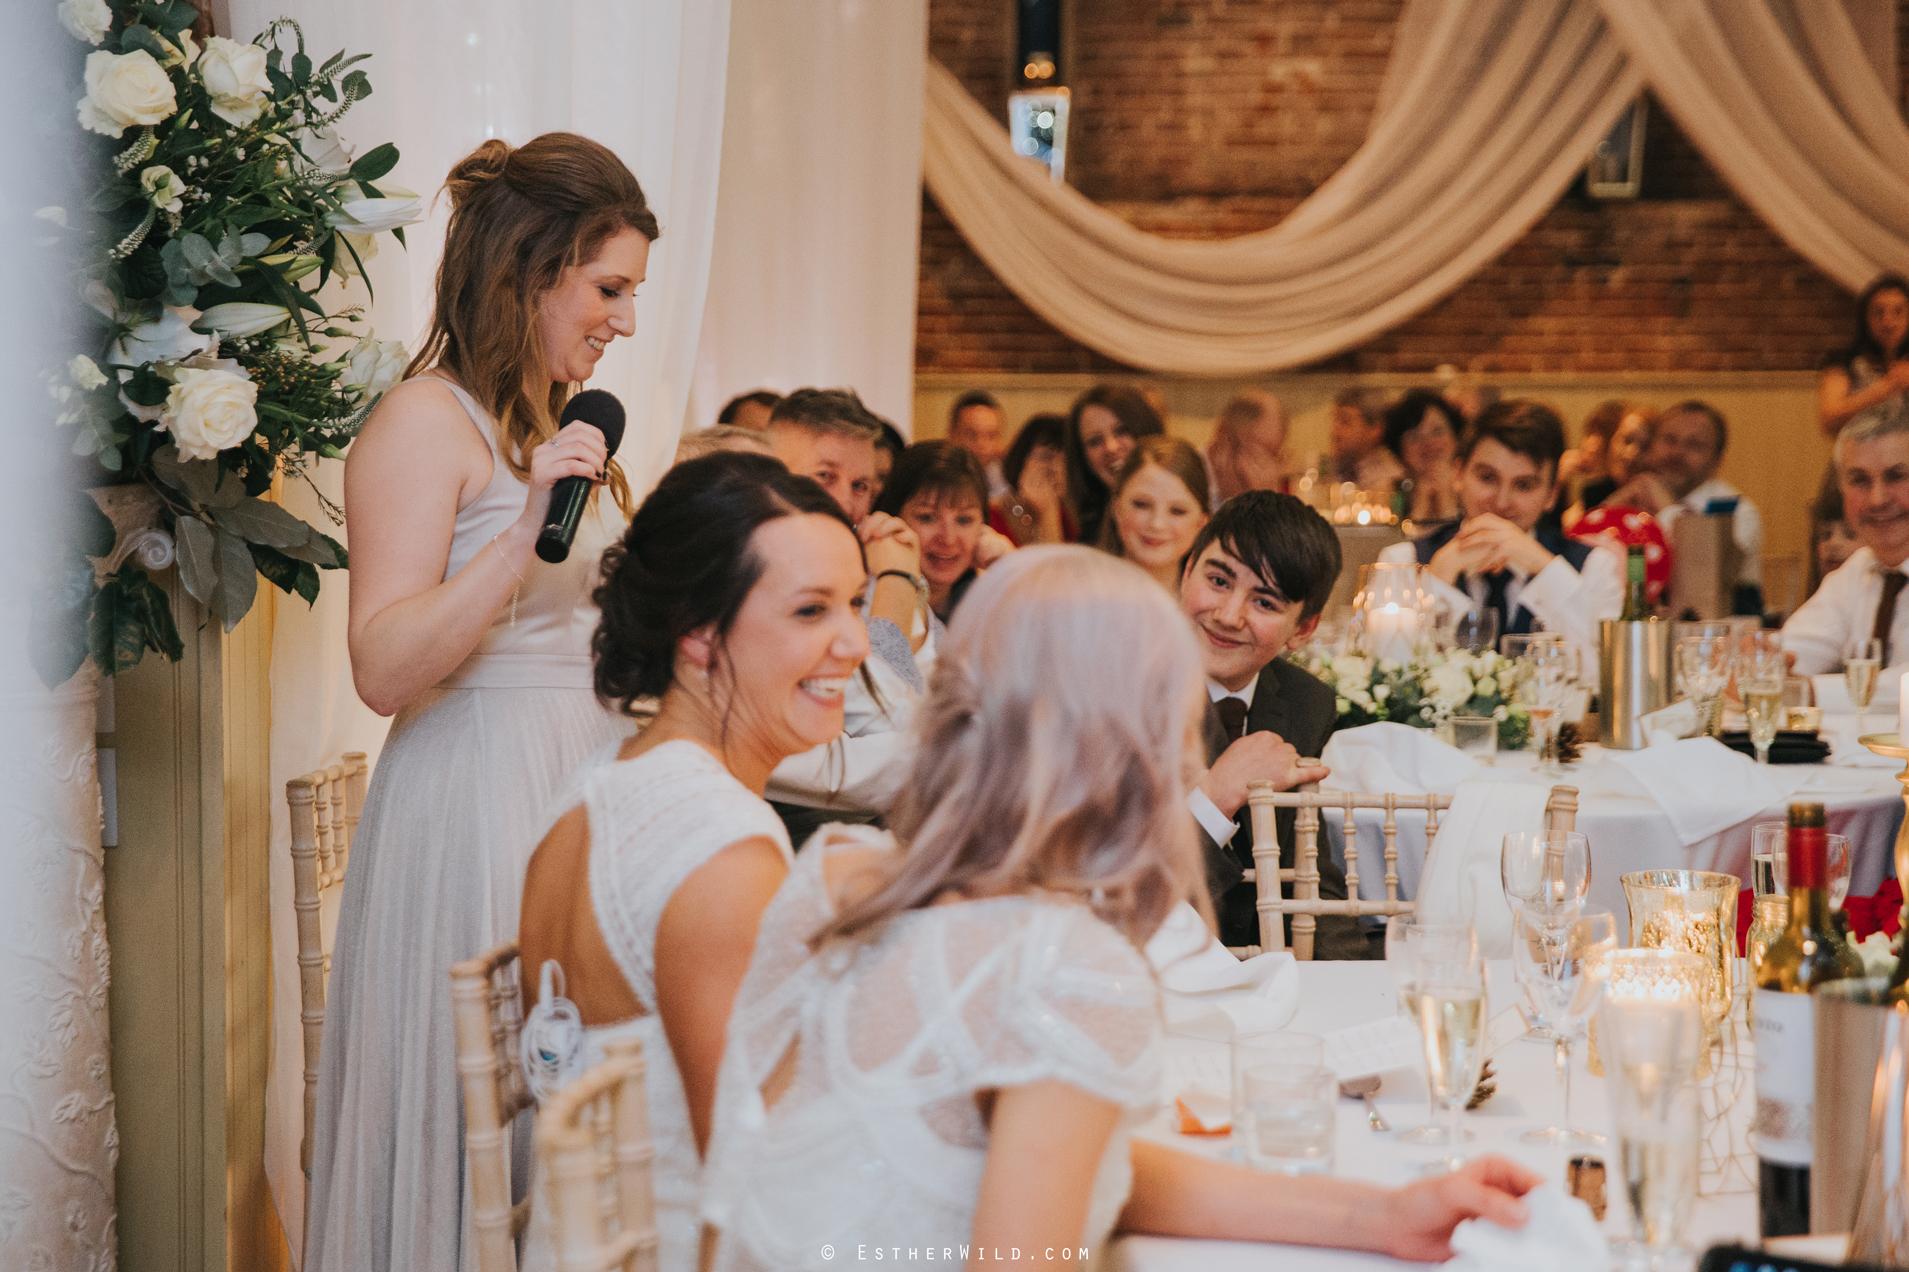 Elms_Barn_Weddings_Suffolk_Photographer_Copyright_Esther_Wild_IMG_2721.jpg